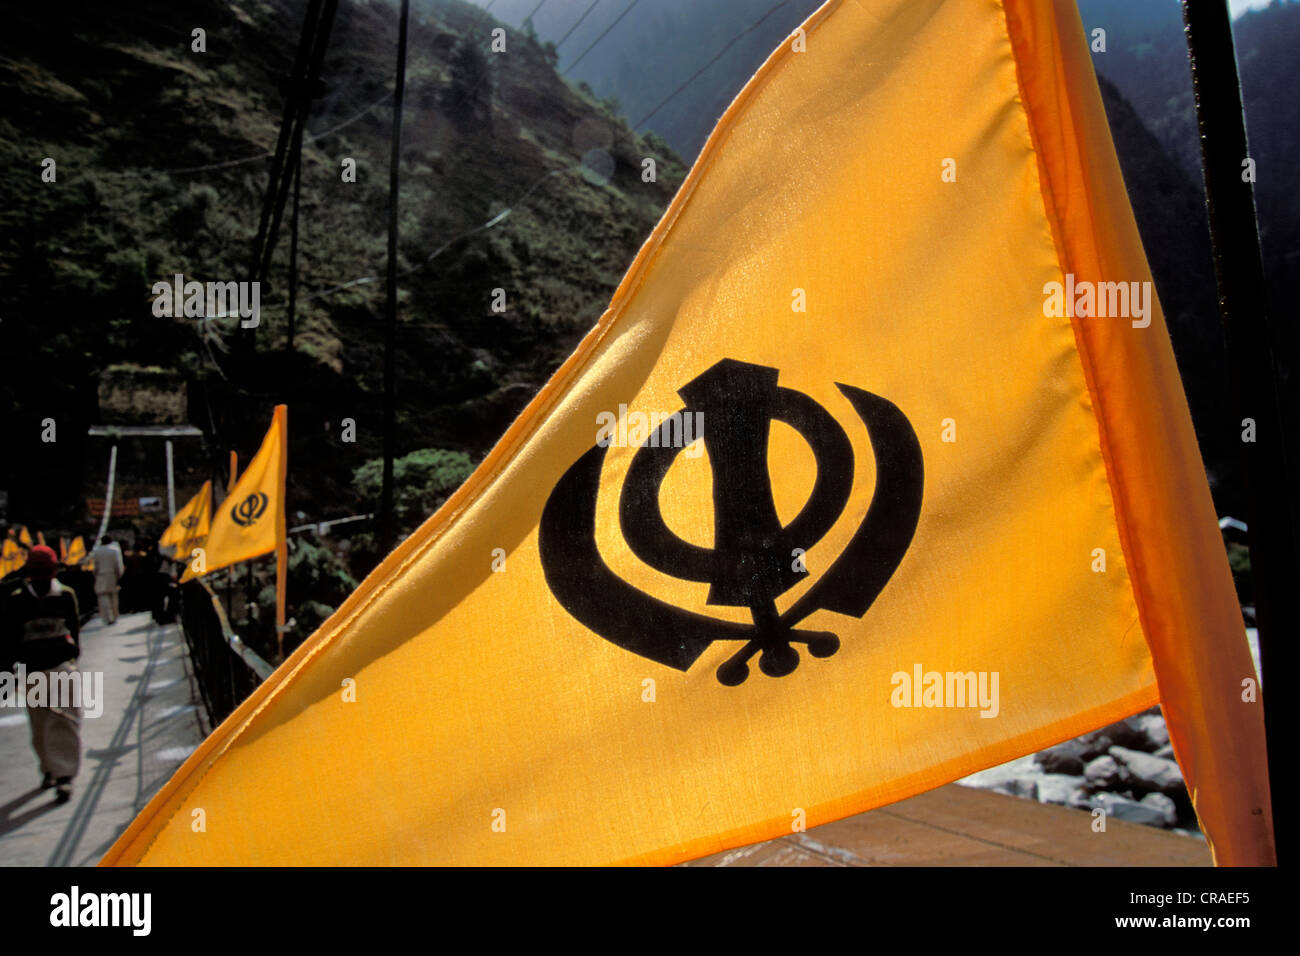 Sikh Khanda Flag Stock Photos & Sikh Khanda Flag Stock Images - Alamy